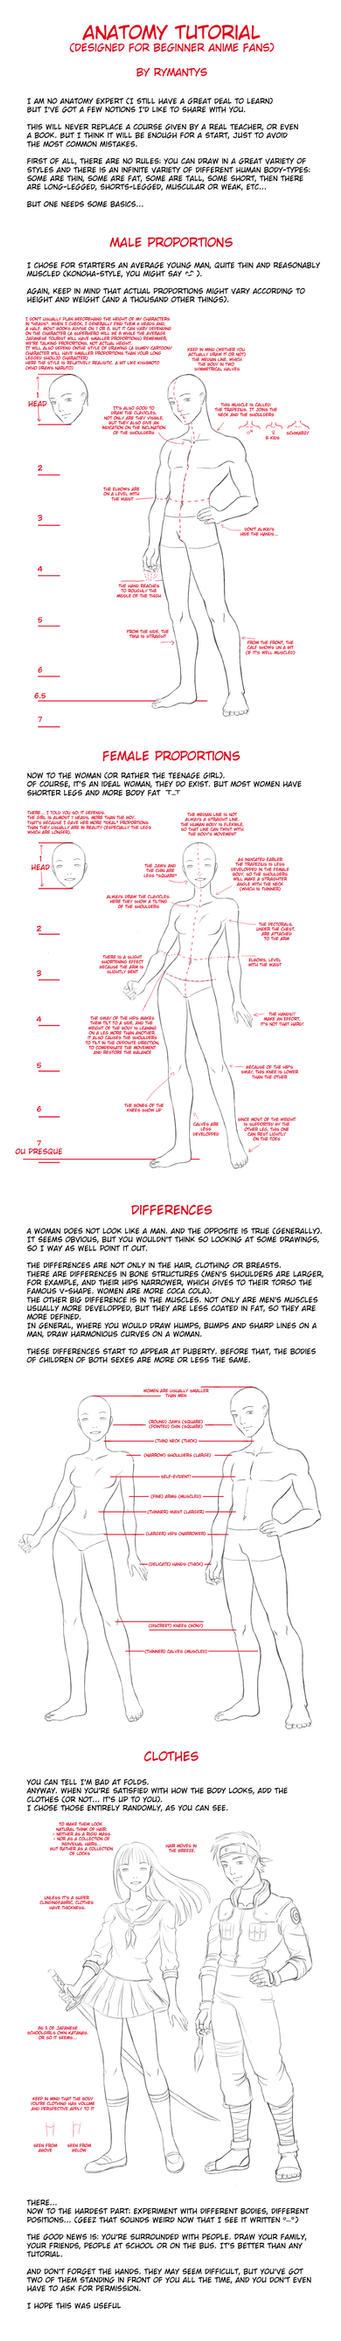 Anatomy tutorial for beginners by RyMantys